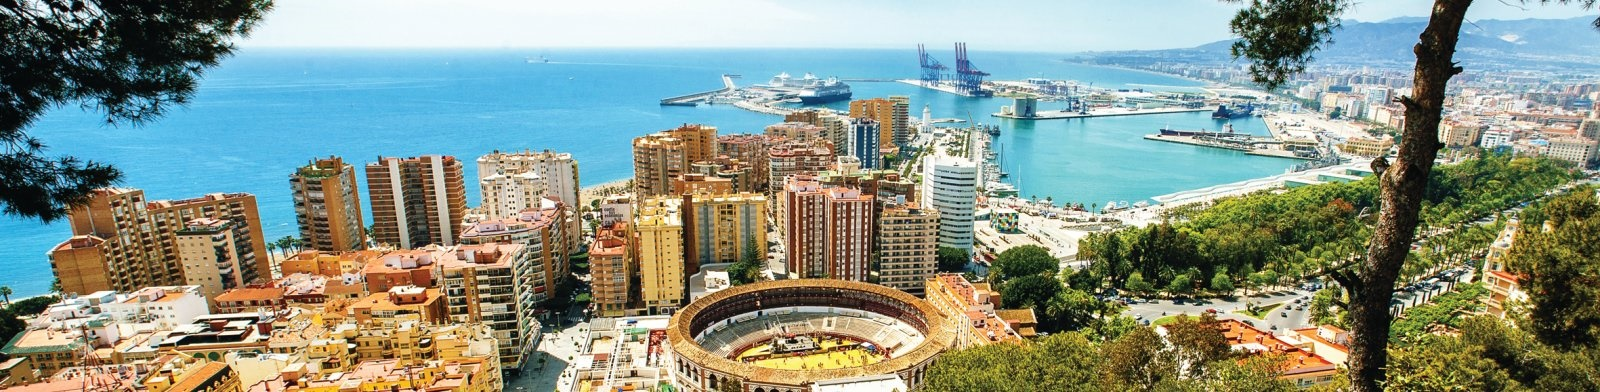 Malaga, dock and city image